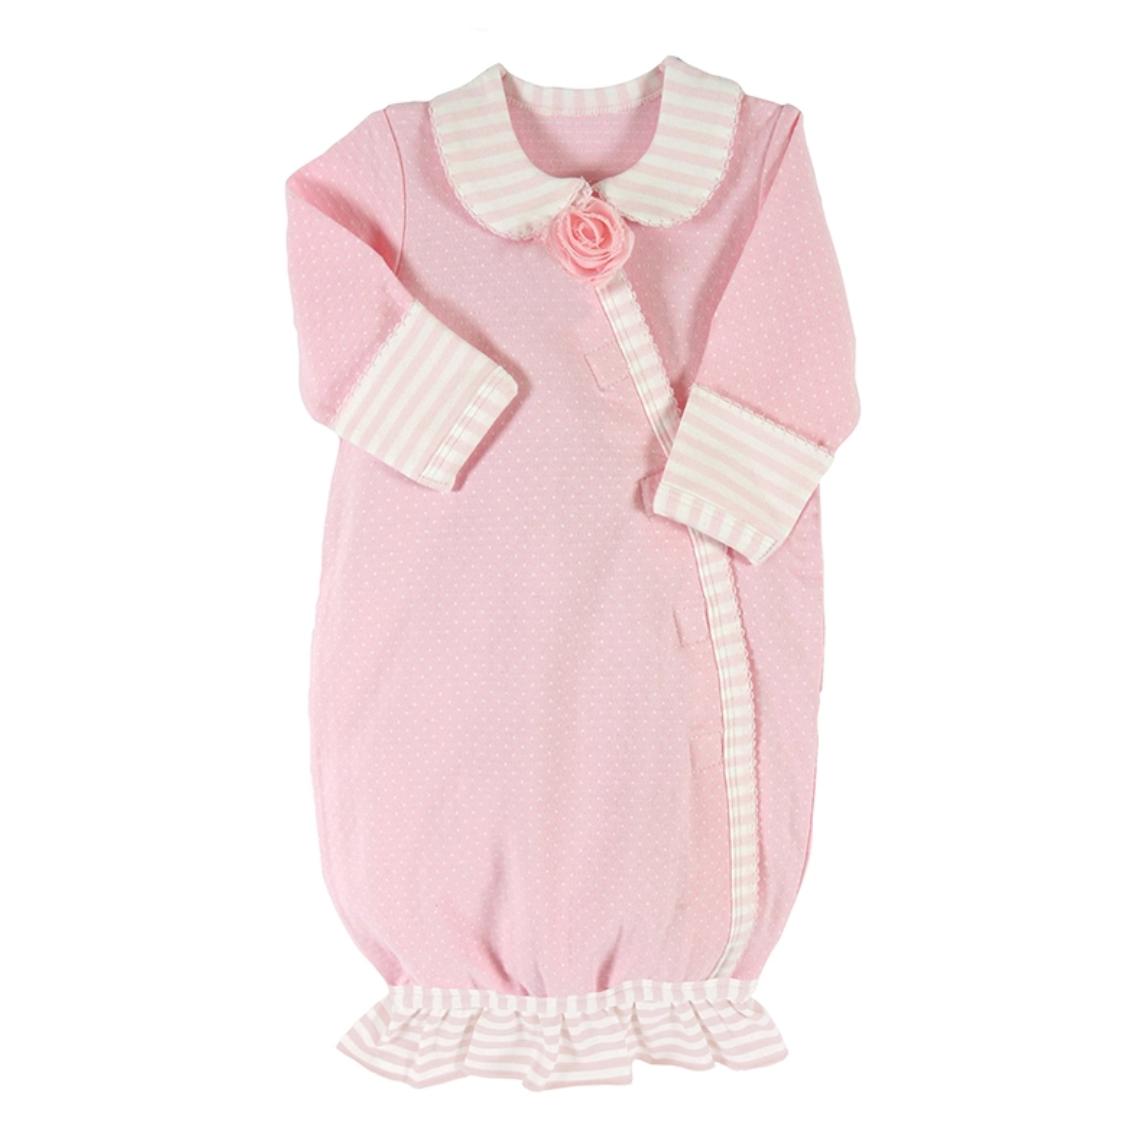 Preemie stripey gown light pink